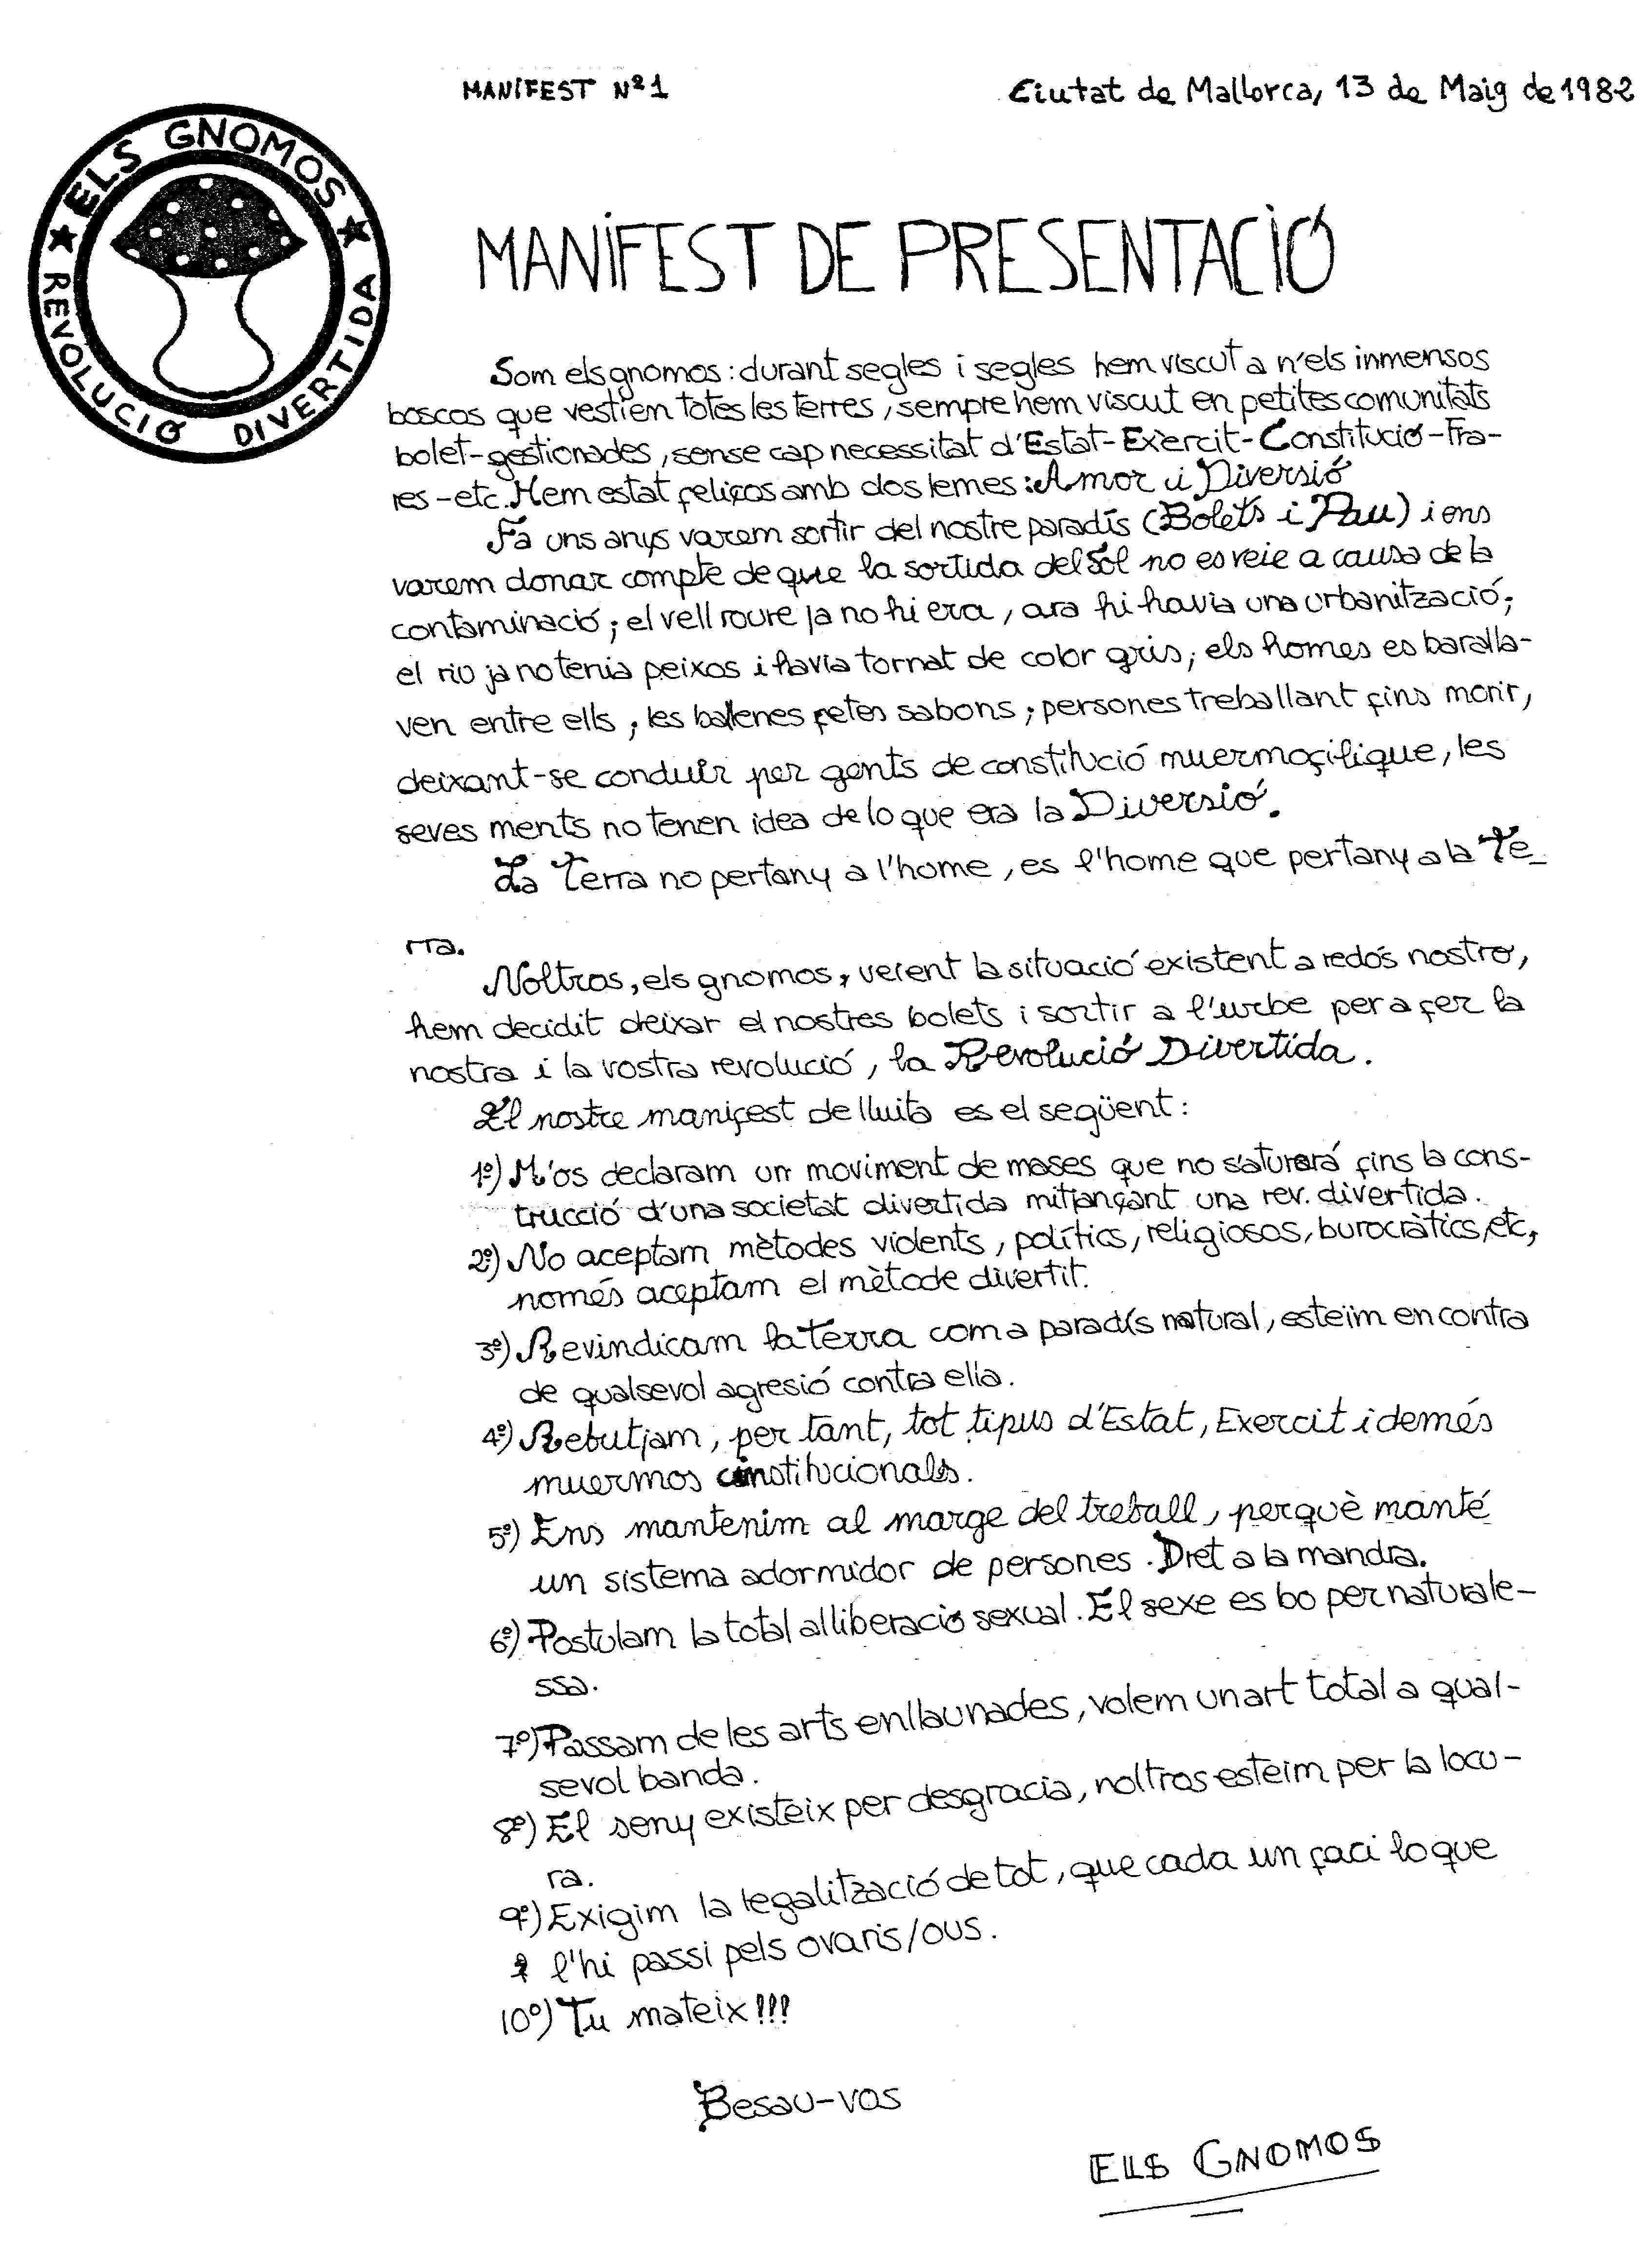 Manifest d'Els Gnomos